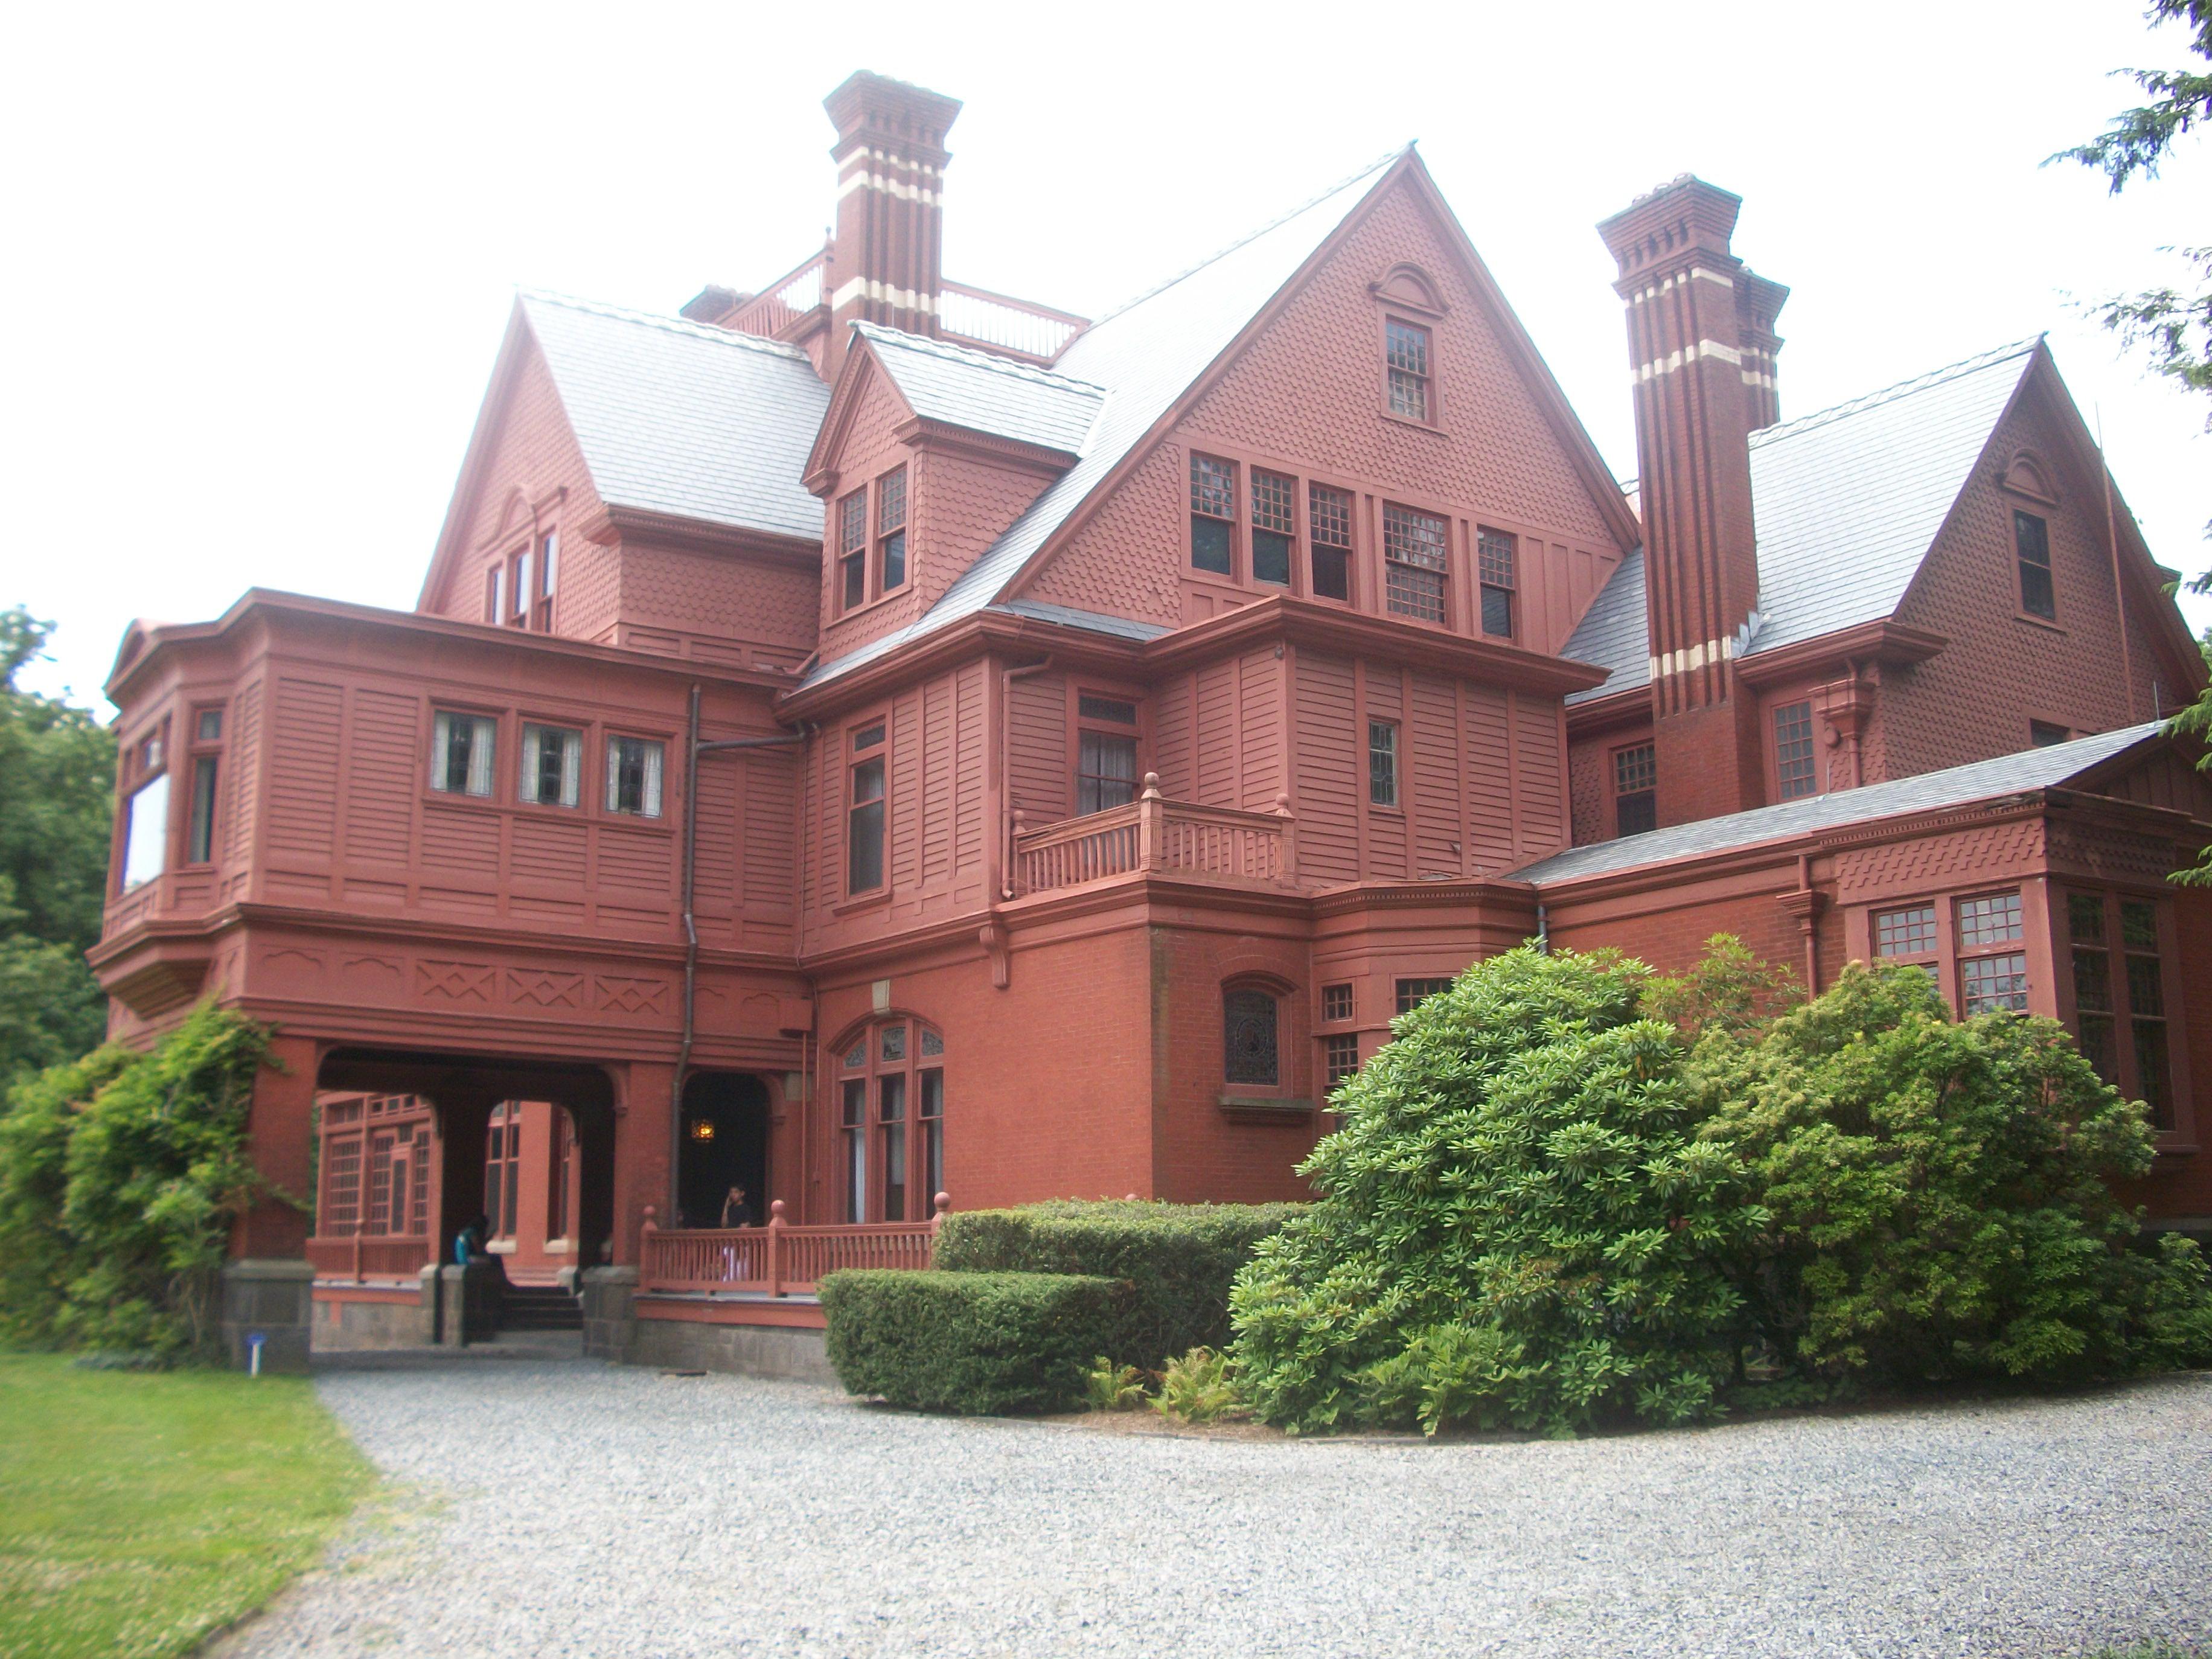 Glenmont, Thomas Edison's estate in Llewellyn Park in West Orange in Essex County, New Jersey. Photo taken circa June 2010.